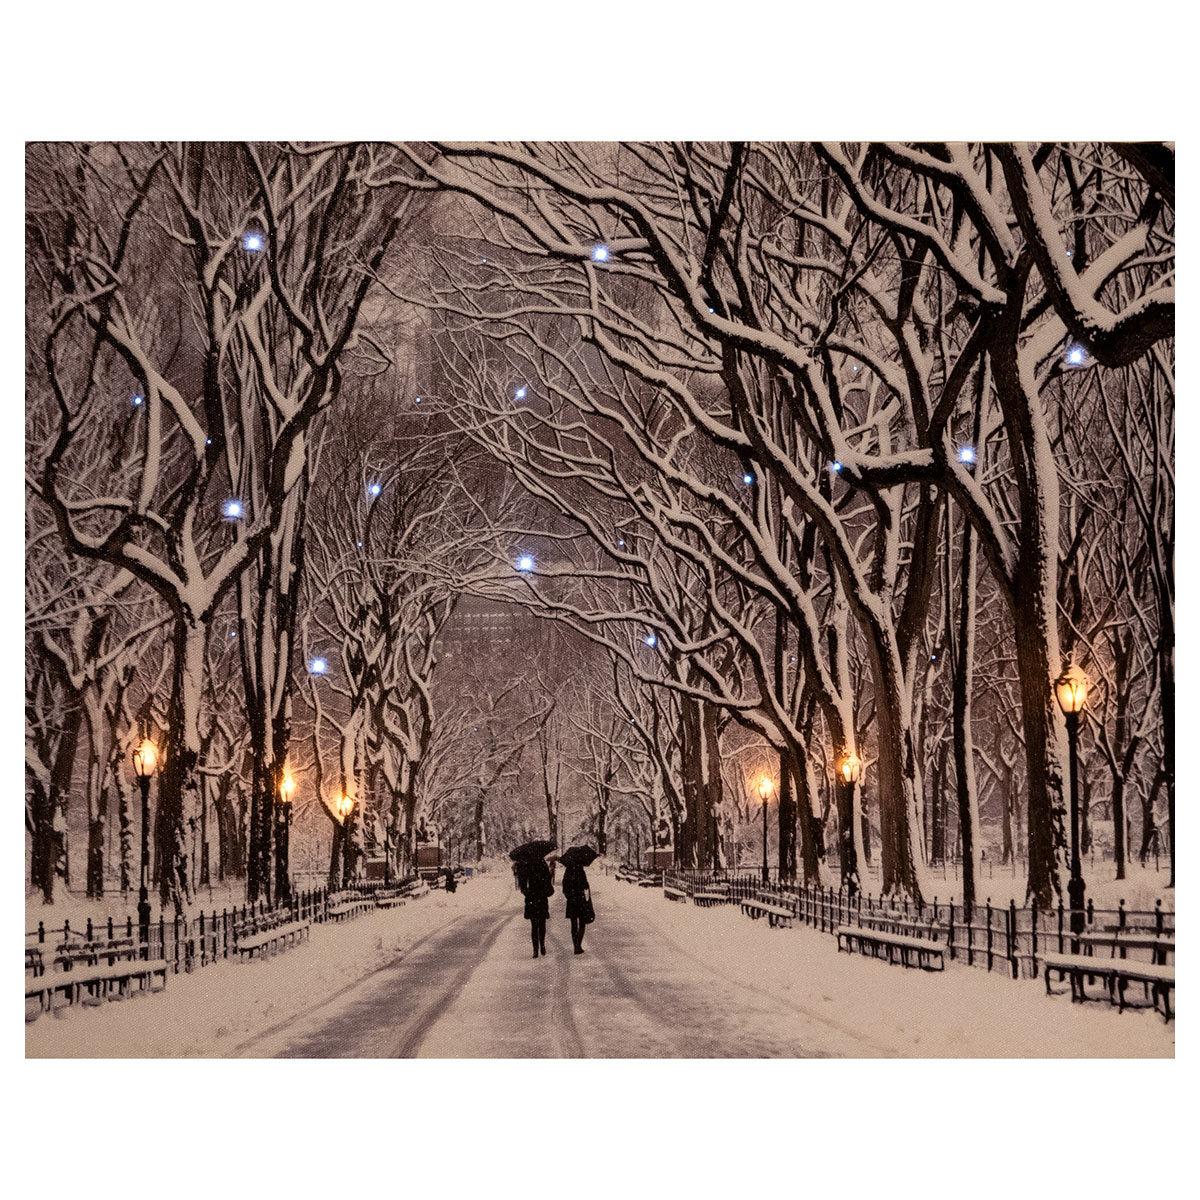 LED-Bild Park im Schnee, 5 LEDs, 38x48 cm